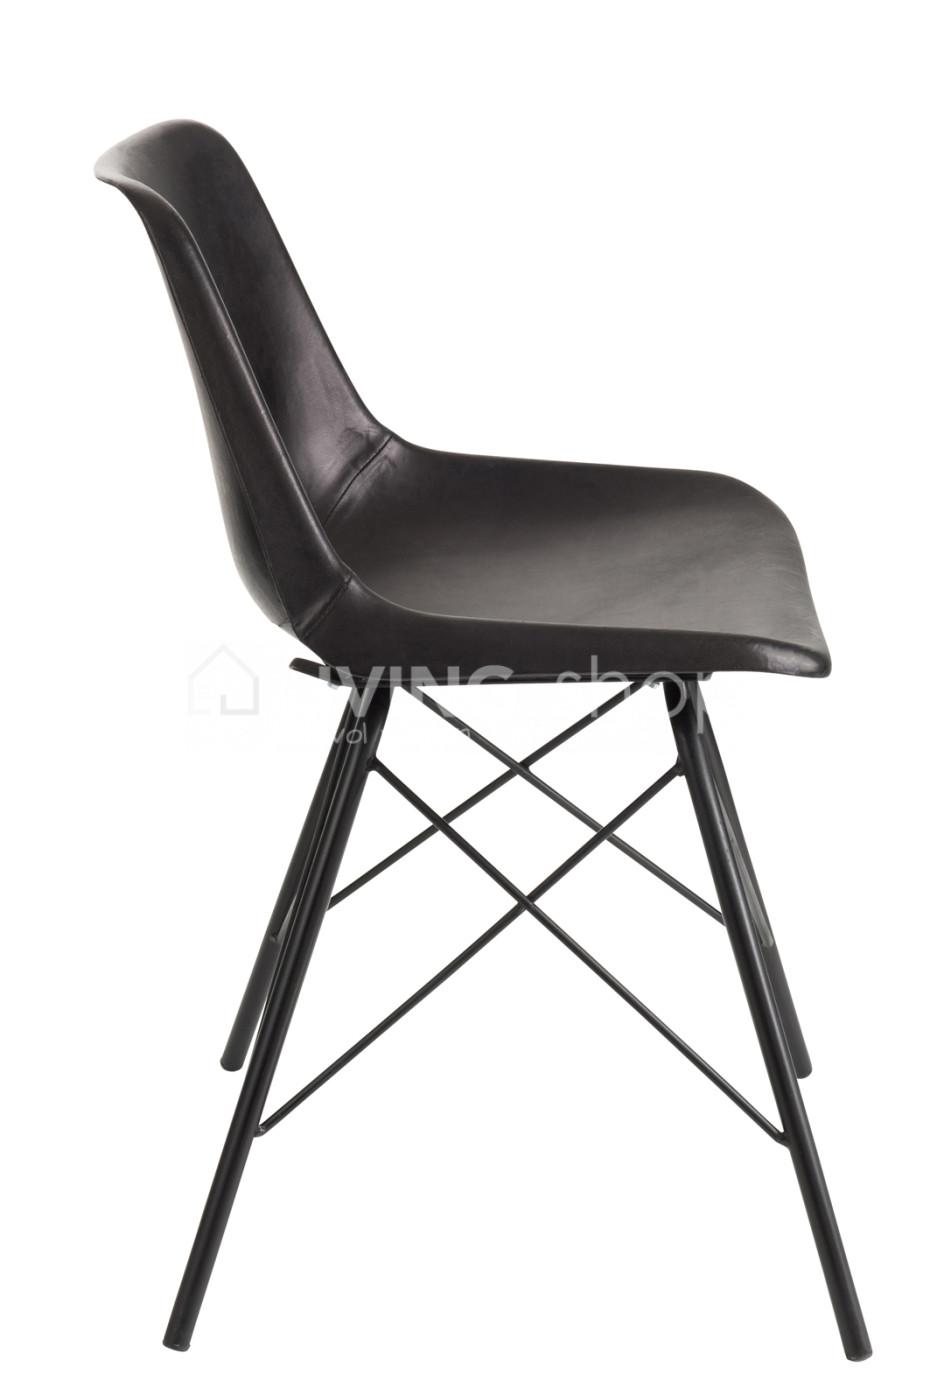 Design stoelen replica design eames dsw stoelen online for Replica design